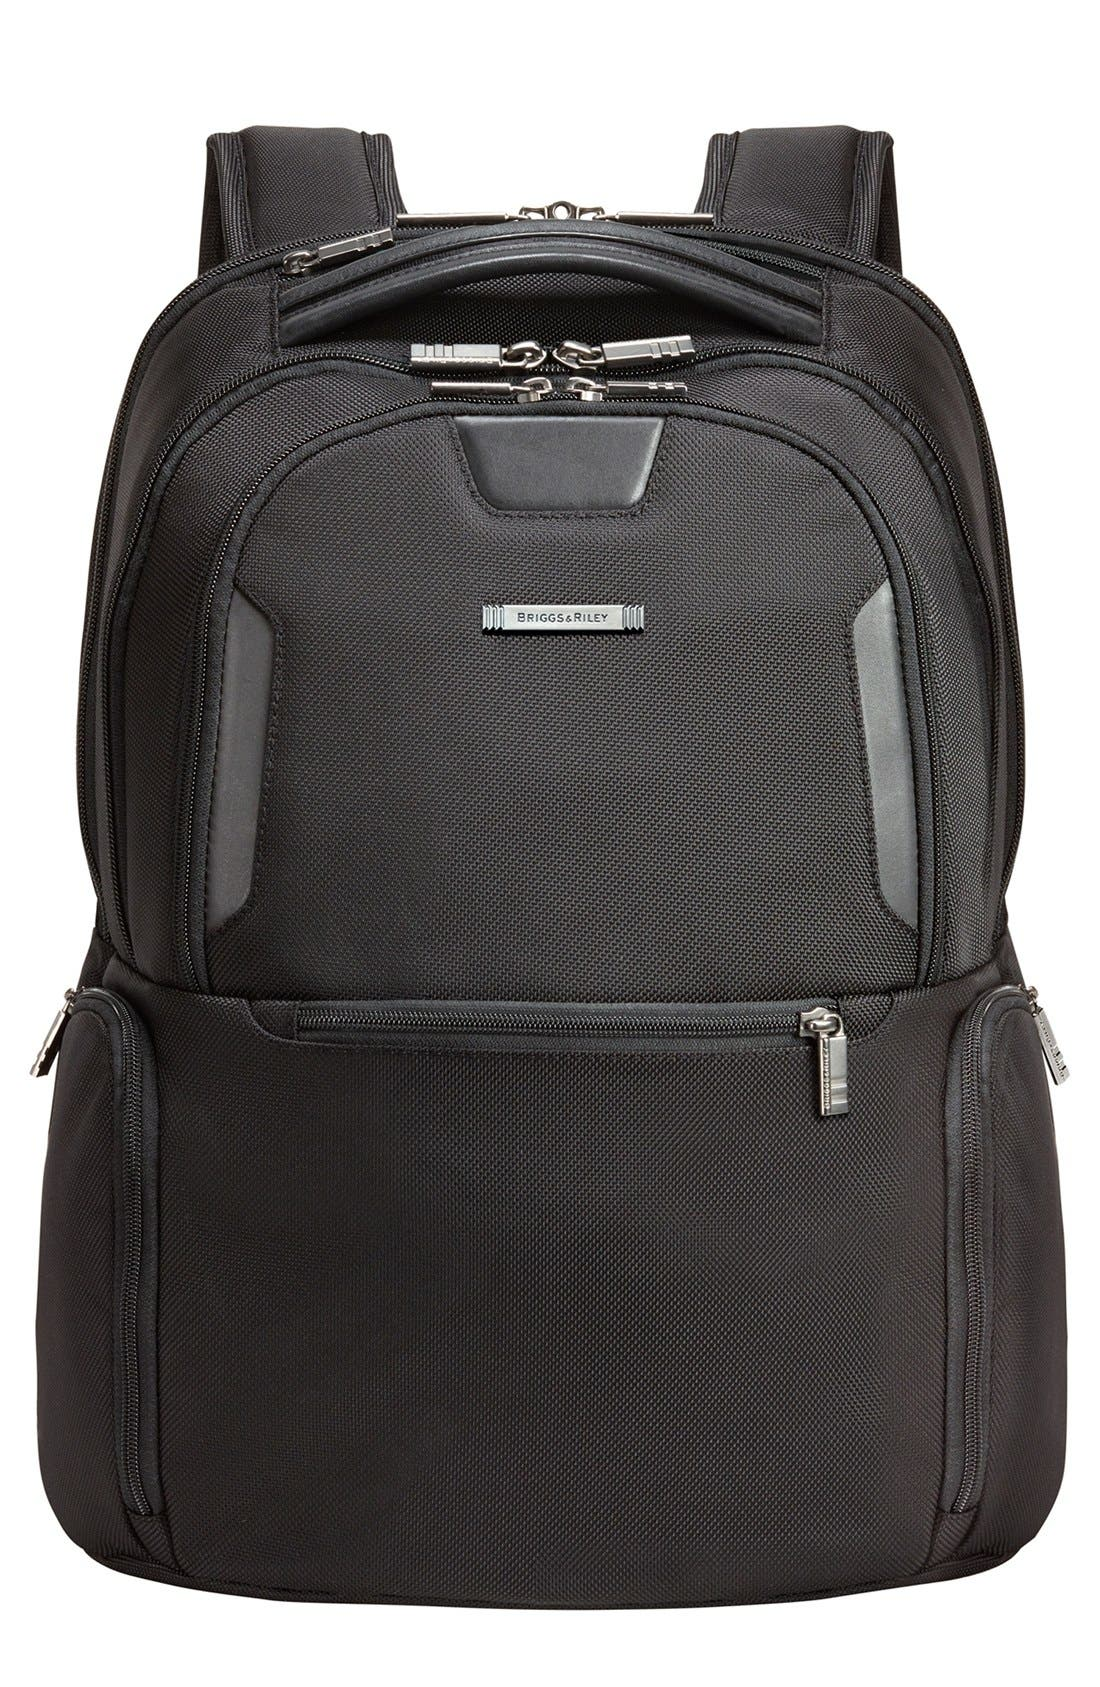 @work - Medium Backpack,                         Main,                         color, 004